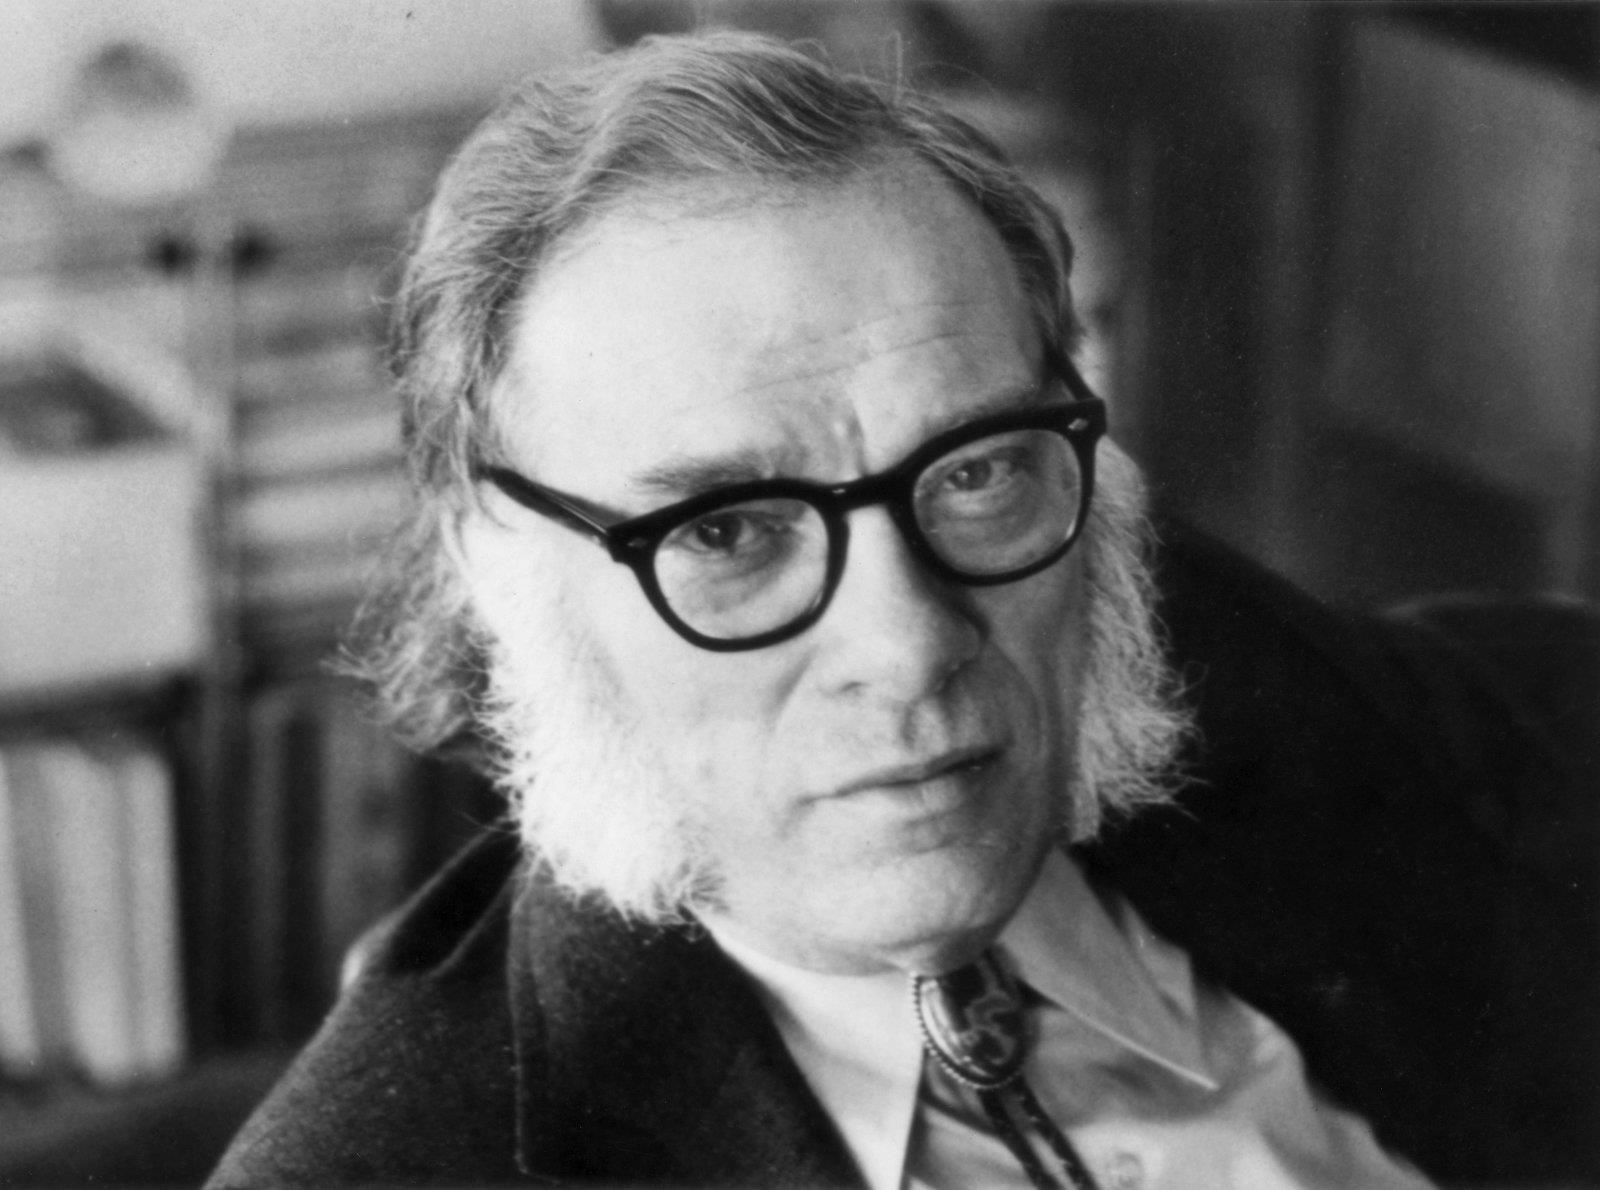 Apple moves forward with TV adaptation of Asimov's 'Foundation' | DeviceDaily.com